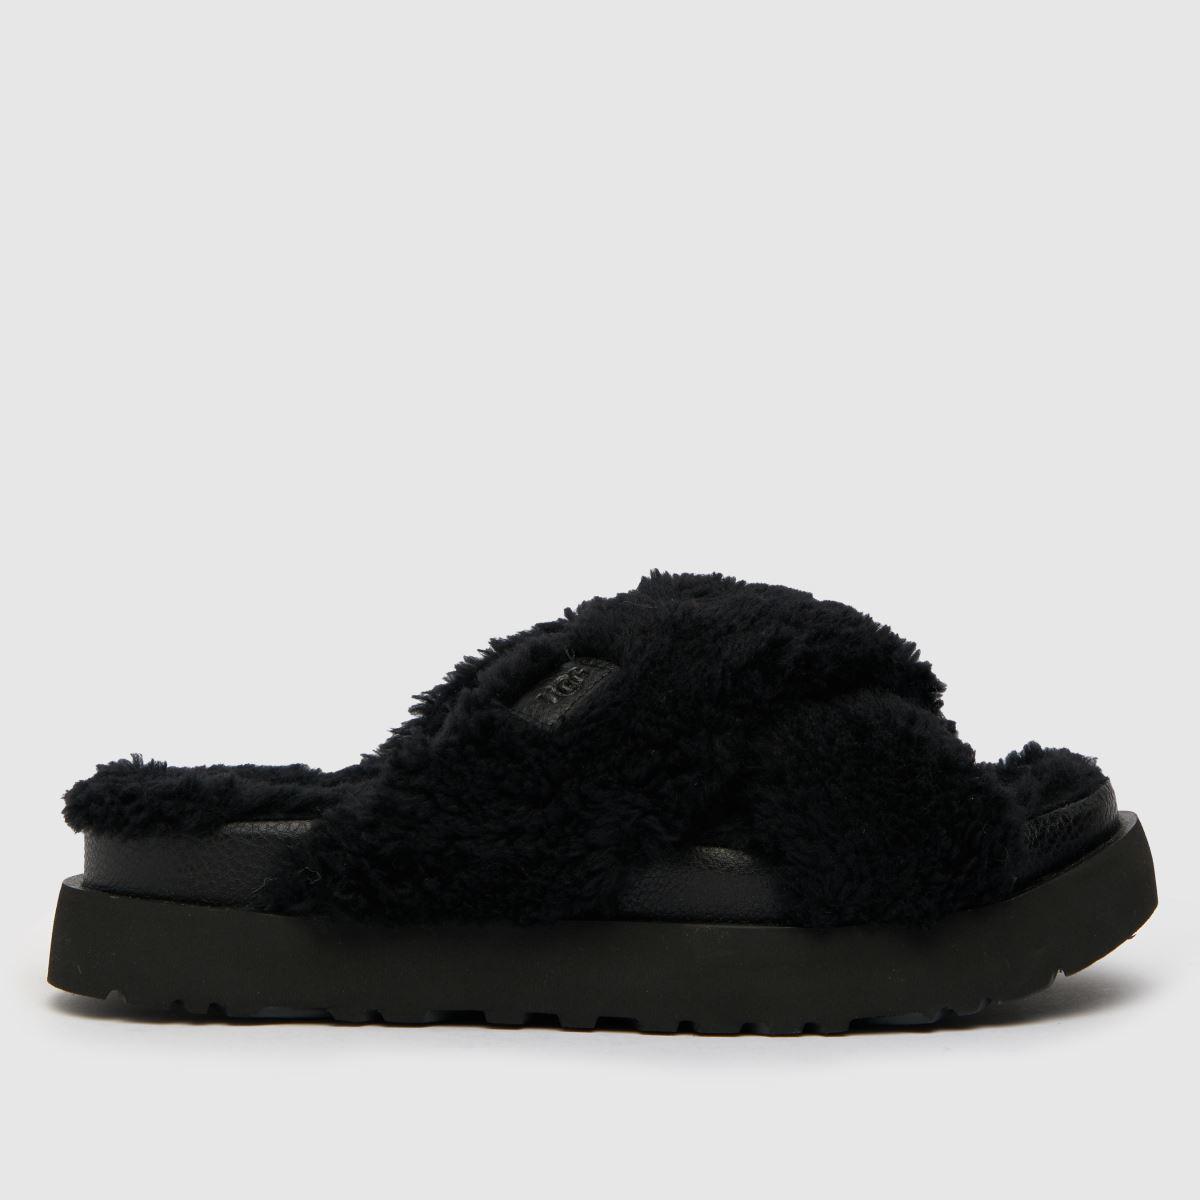 UGG Black Fuzz Sugar Cross Slide Slippers